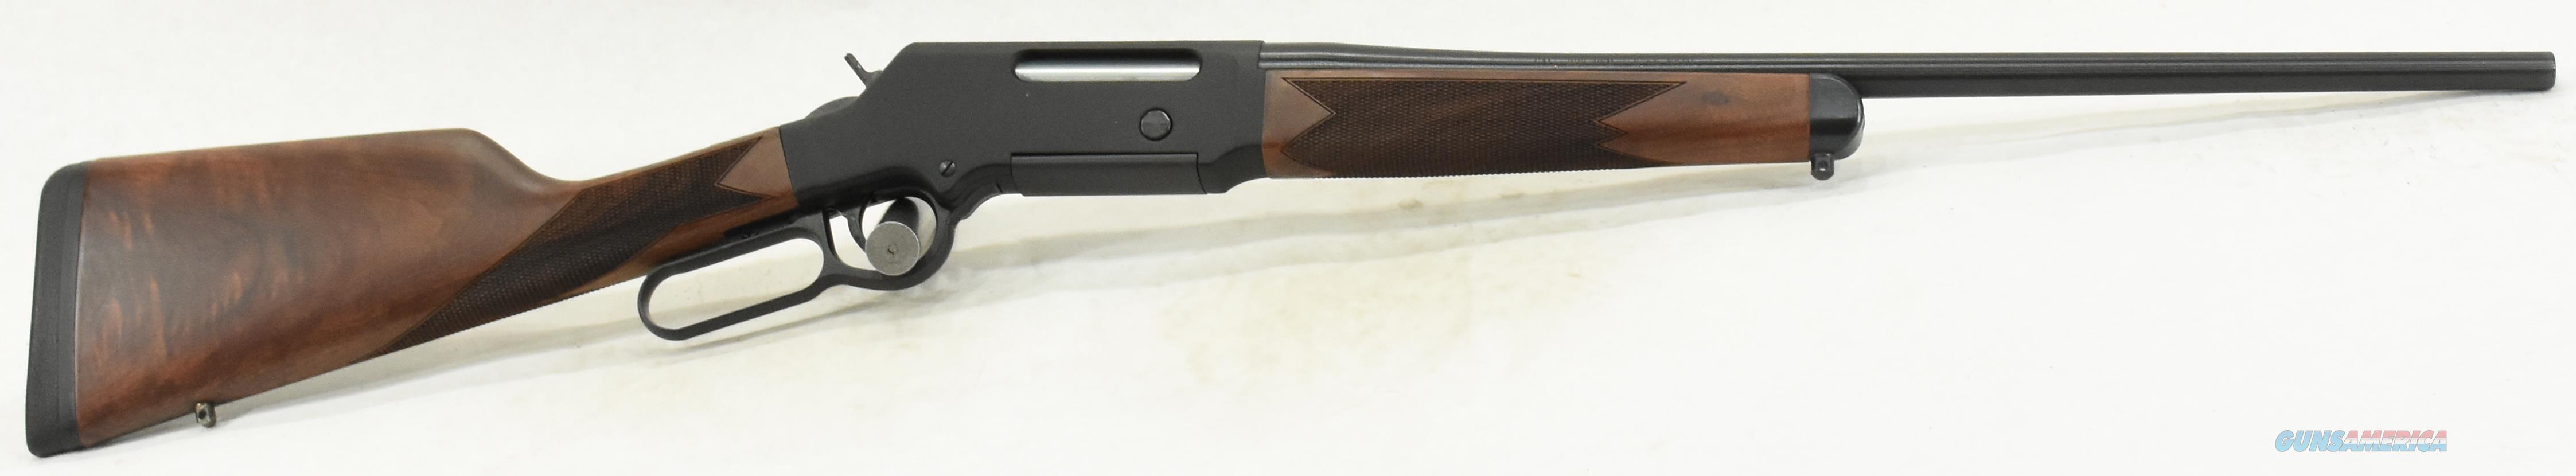 Long Range Lever Rifle 308Win 20In  H014-308  Guns > Rifles > Henry Rifles - Replica